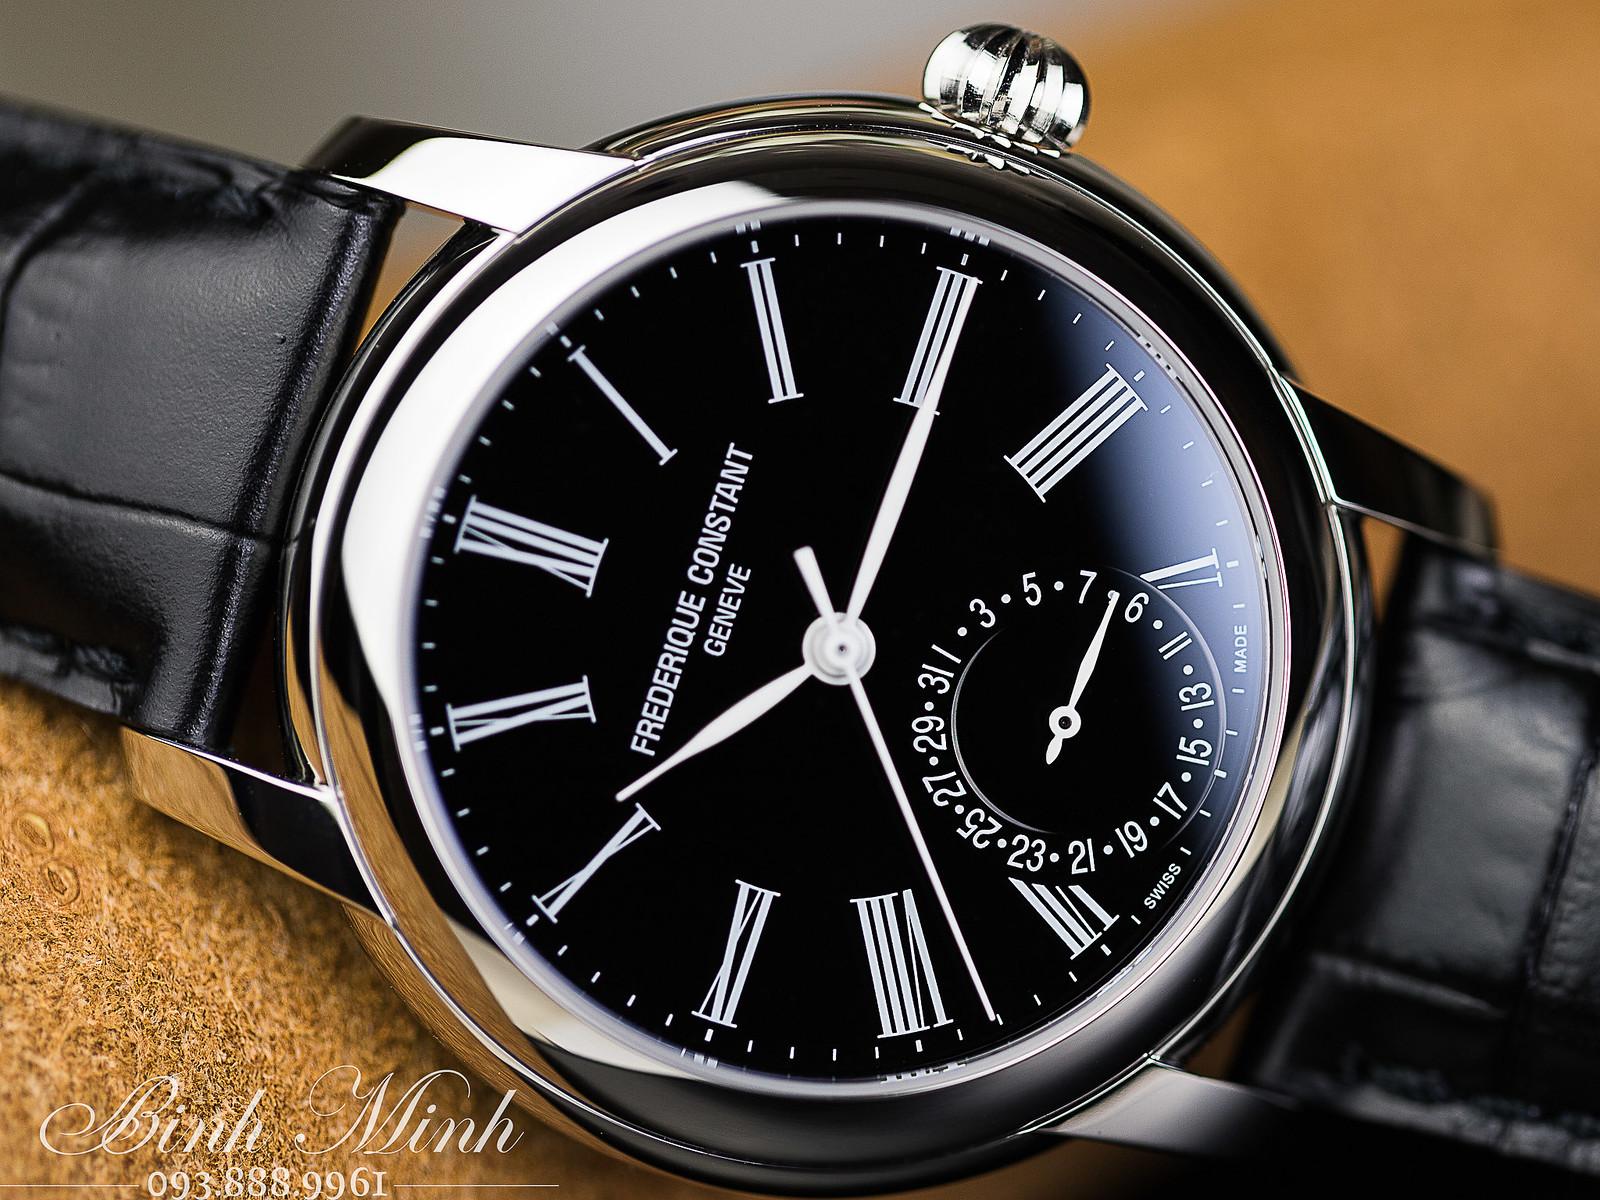 Đồng hồ Frederique Constant Manufacture Classic máy inhouse giá siêu tốt, mặt đen, mới 100%